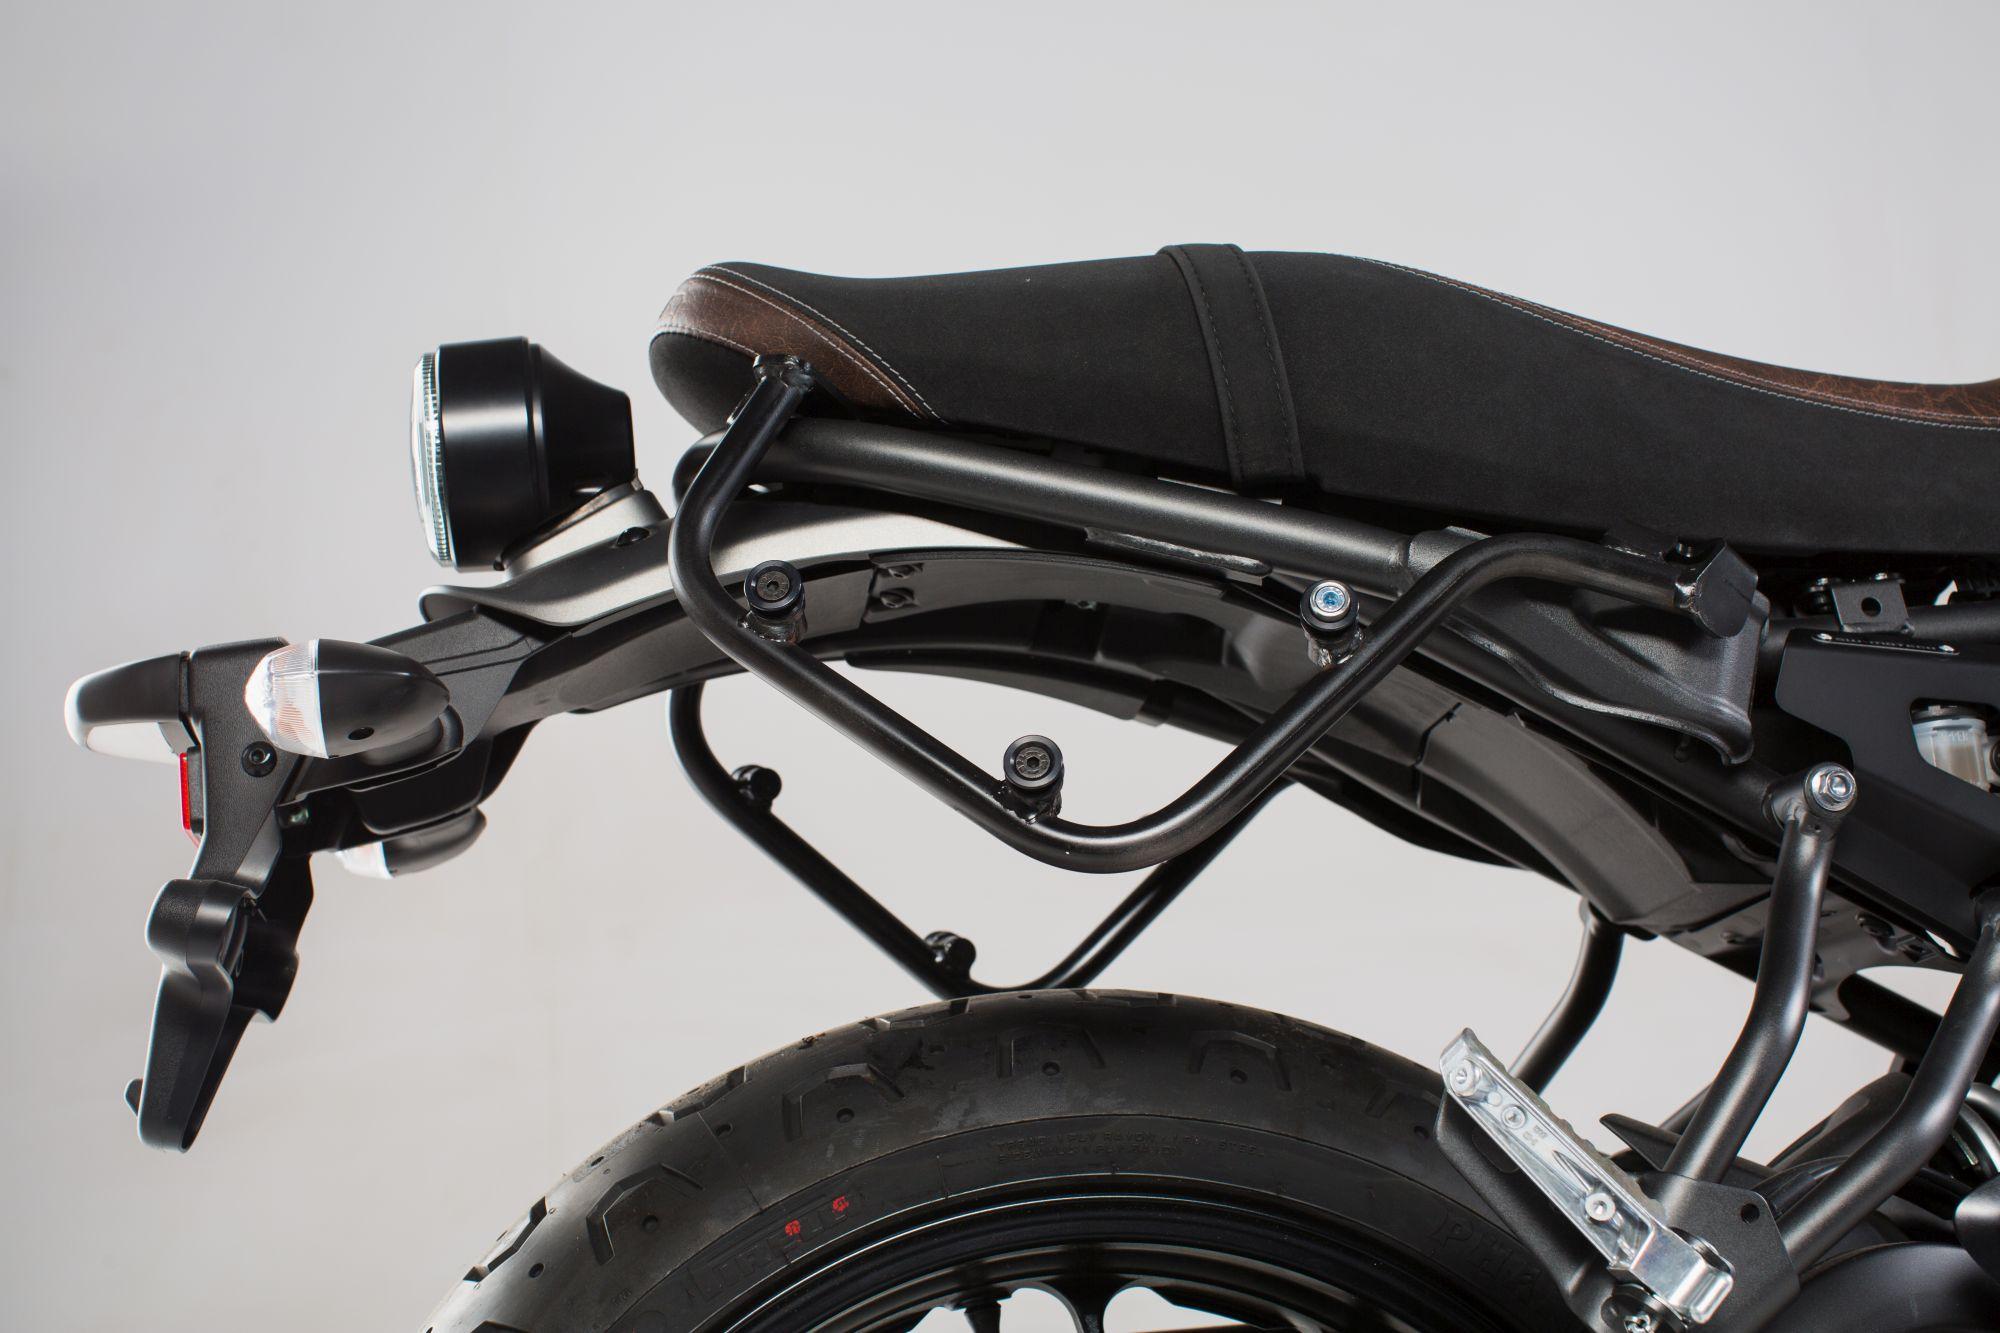 sw motech zubeh r f r die yamaha xsr700 motorrad fotos. Black Bedroom Furniture Sets. Home Design Ideas